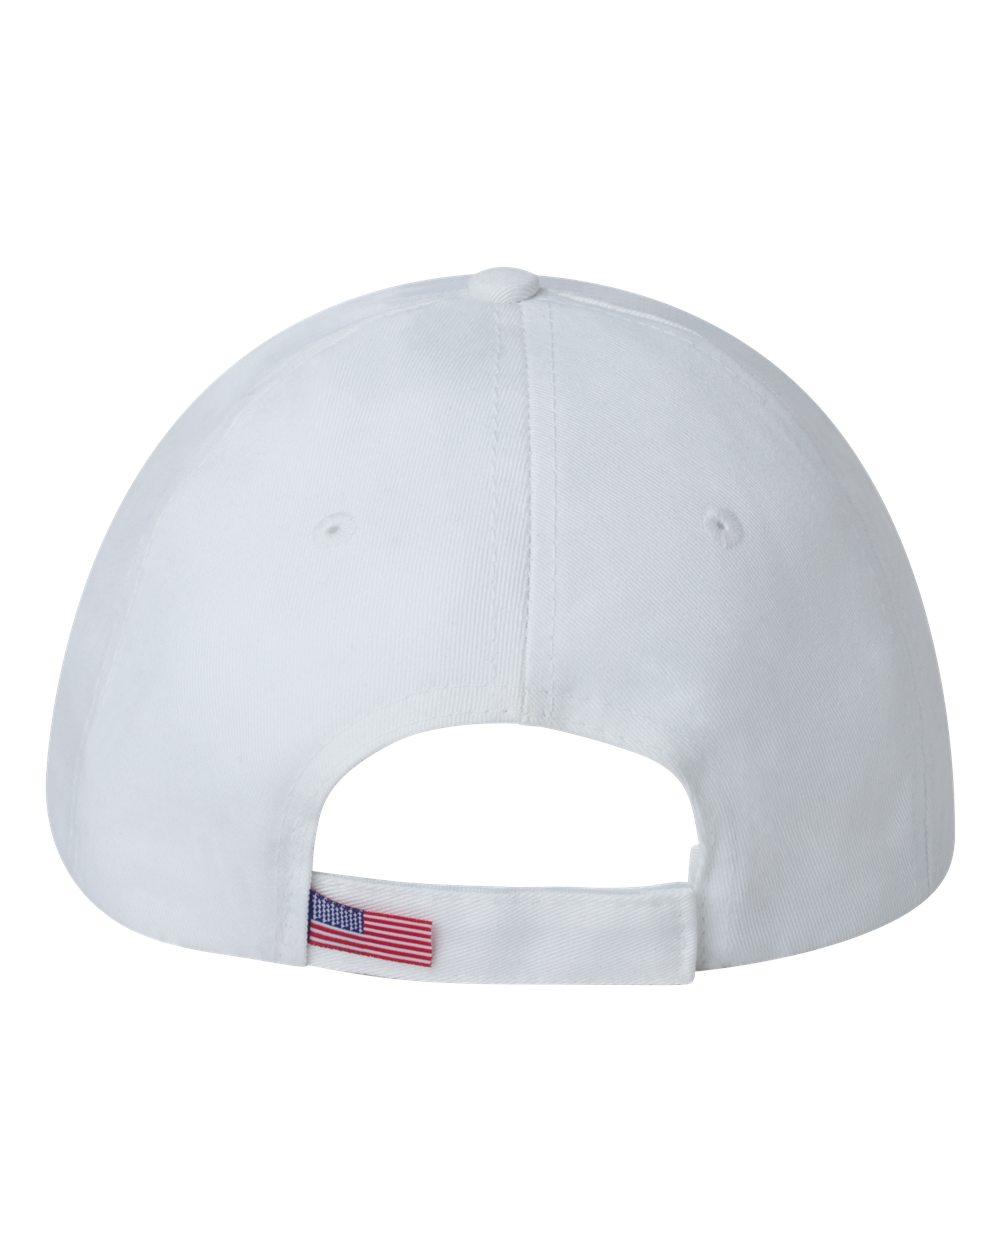 Bayside-Mens-Baseball-USA-Made-Structured-Cap-Hat-3660-six-panel-mid-profile thumbnail 16